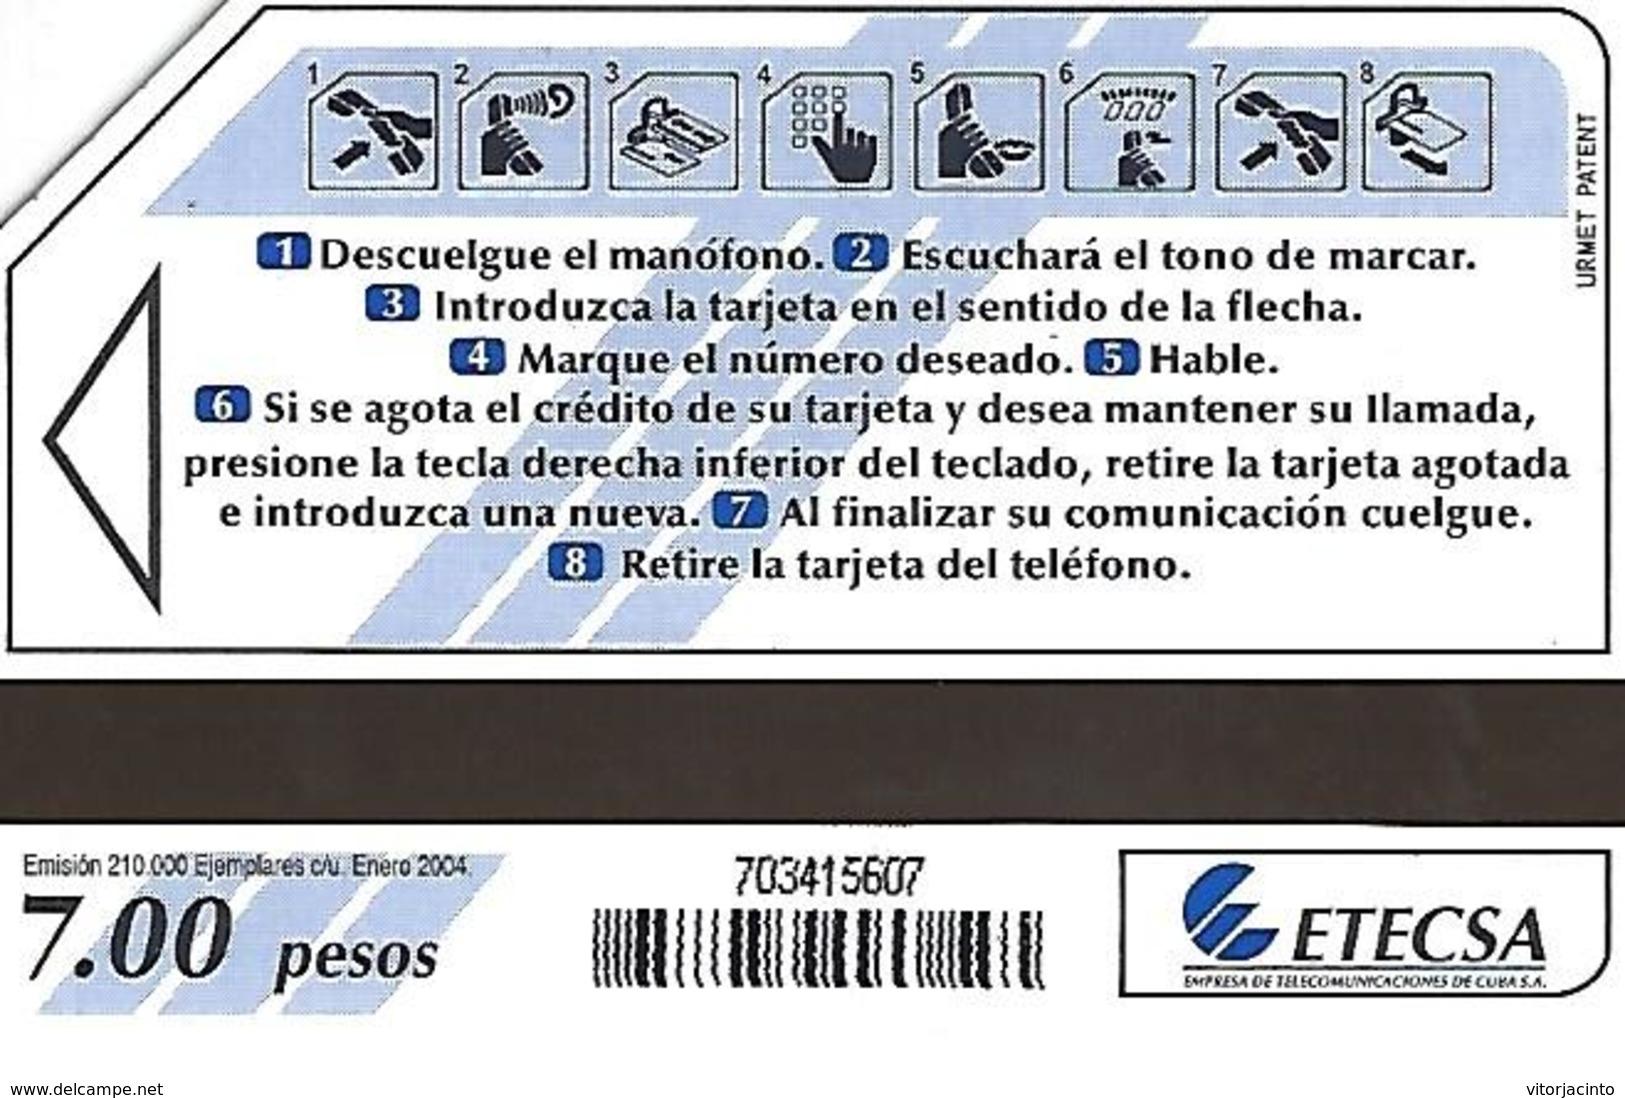 ETECSA - National And Local Phonecard - 7.00 Pesos - Cuba - Cuba